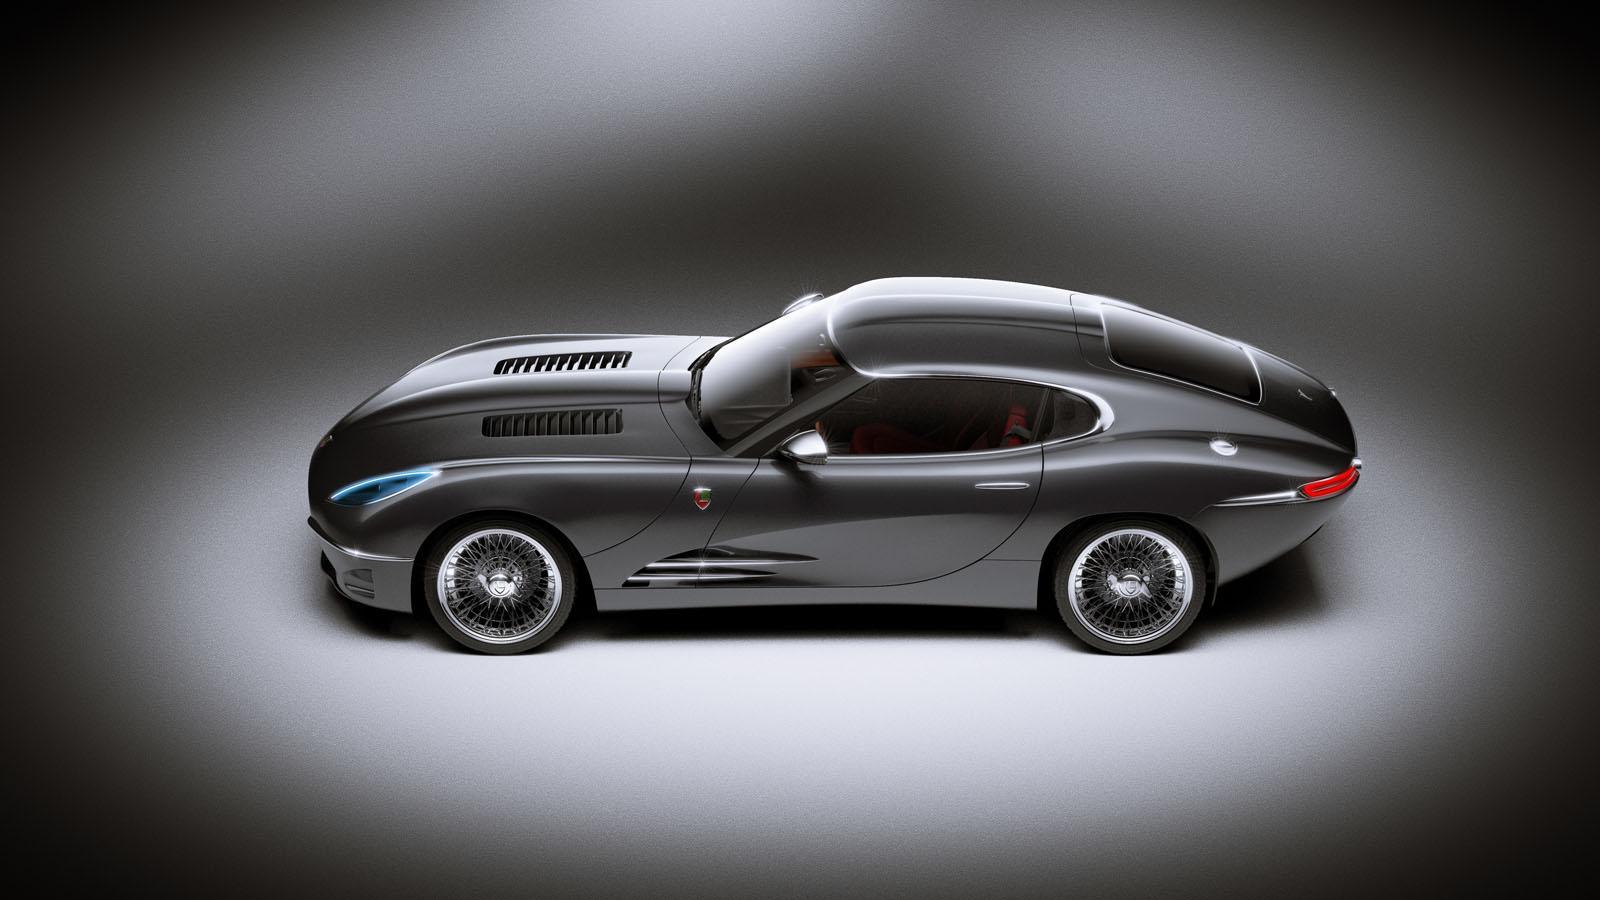 Lyonheart K Is a Modern Jaguar E-Type - autoevolution